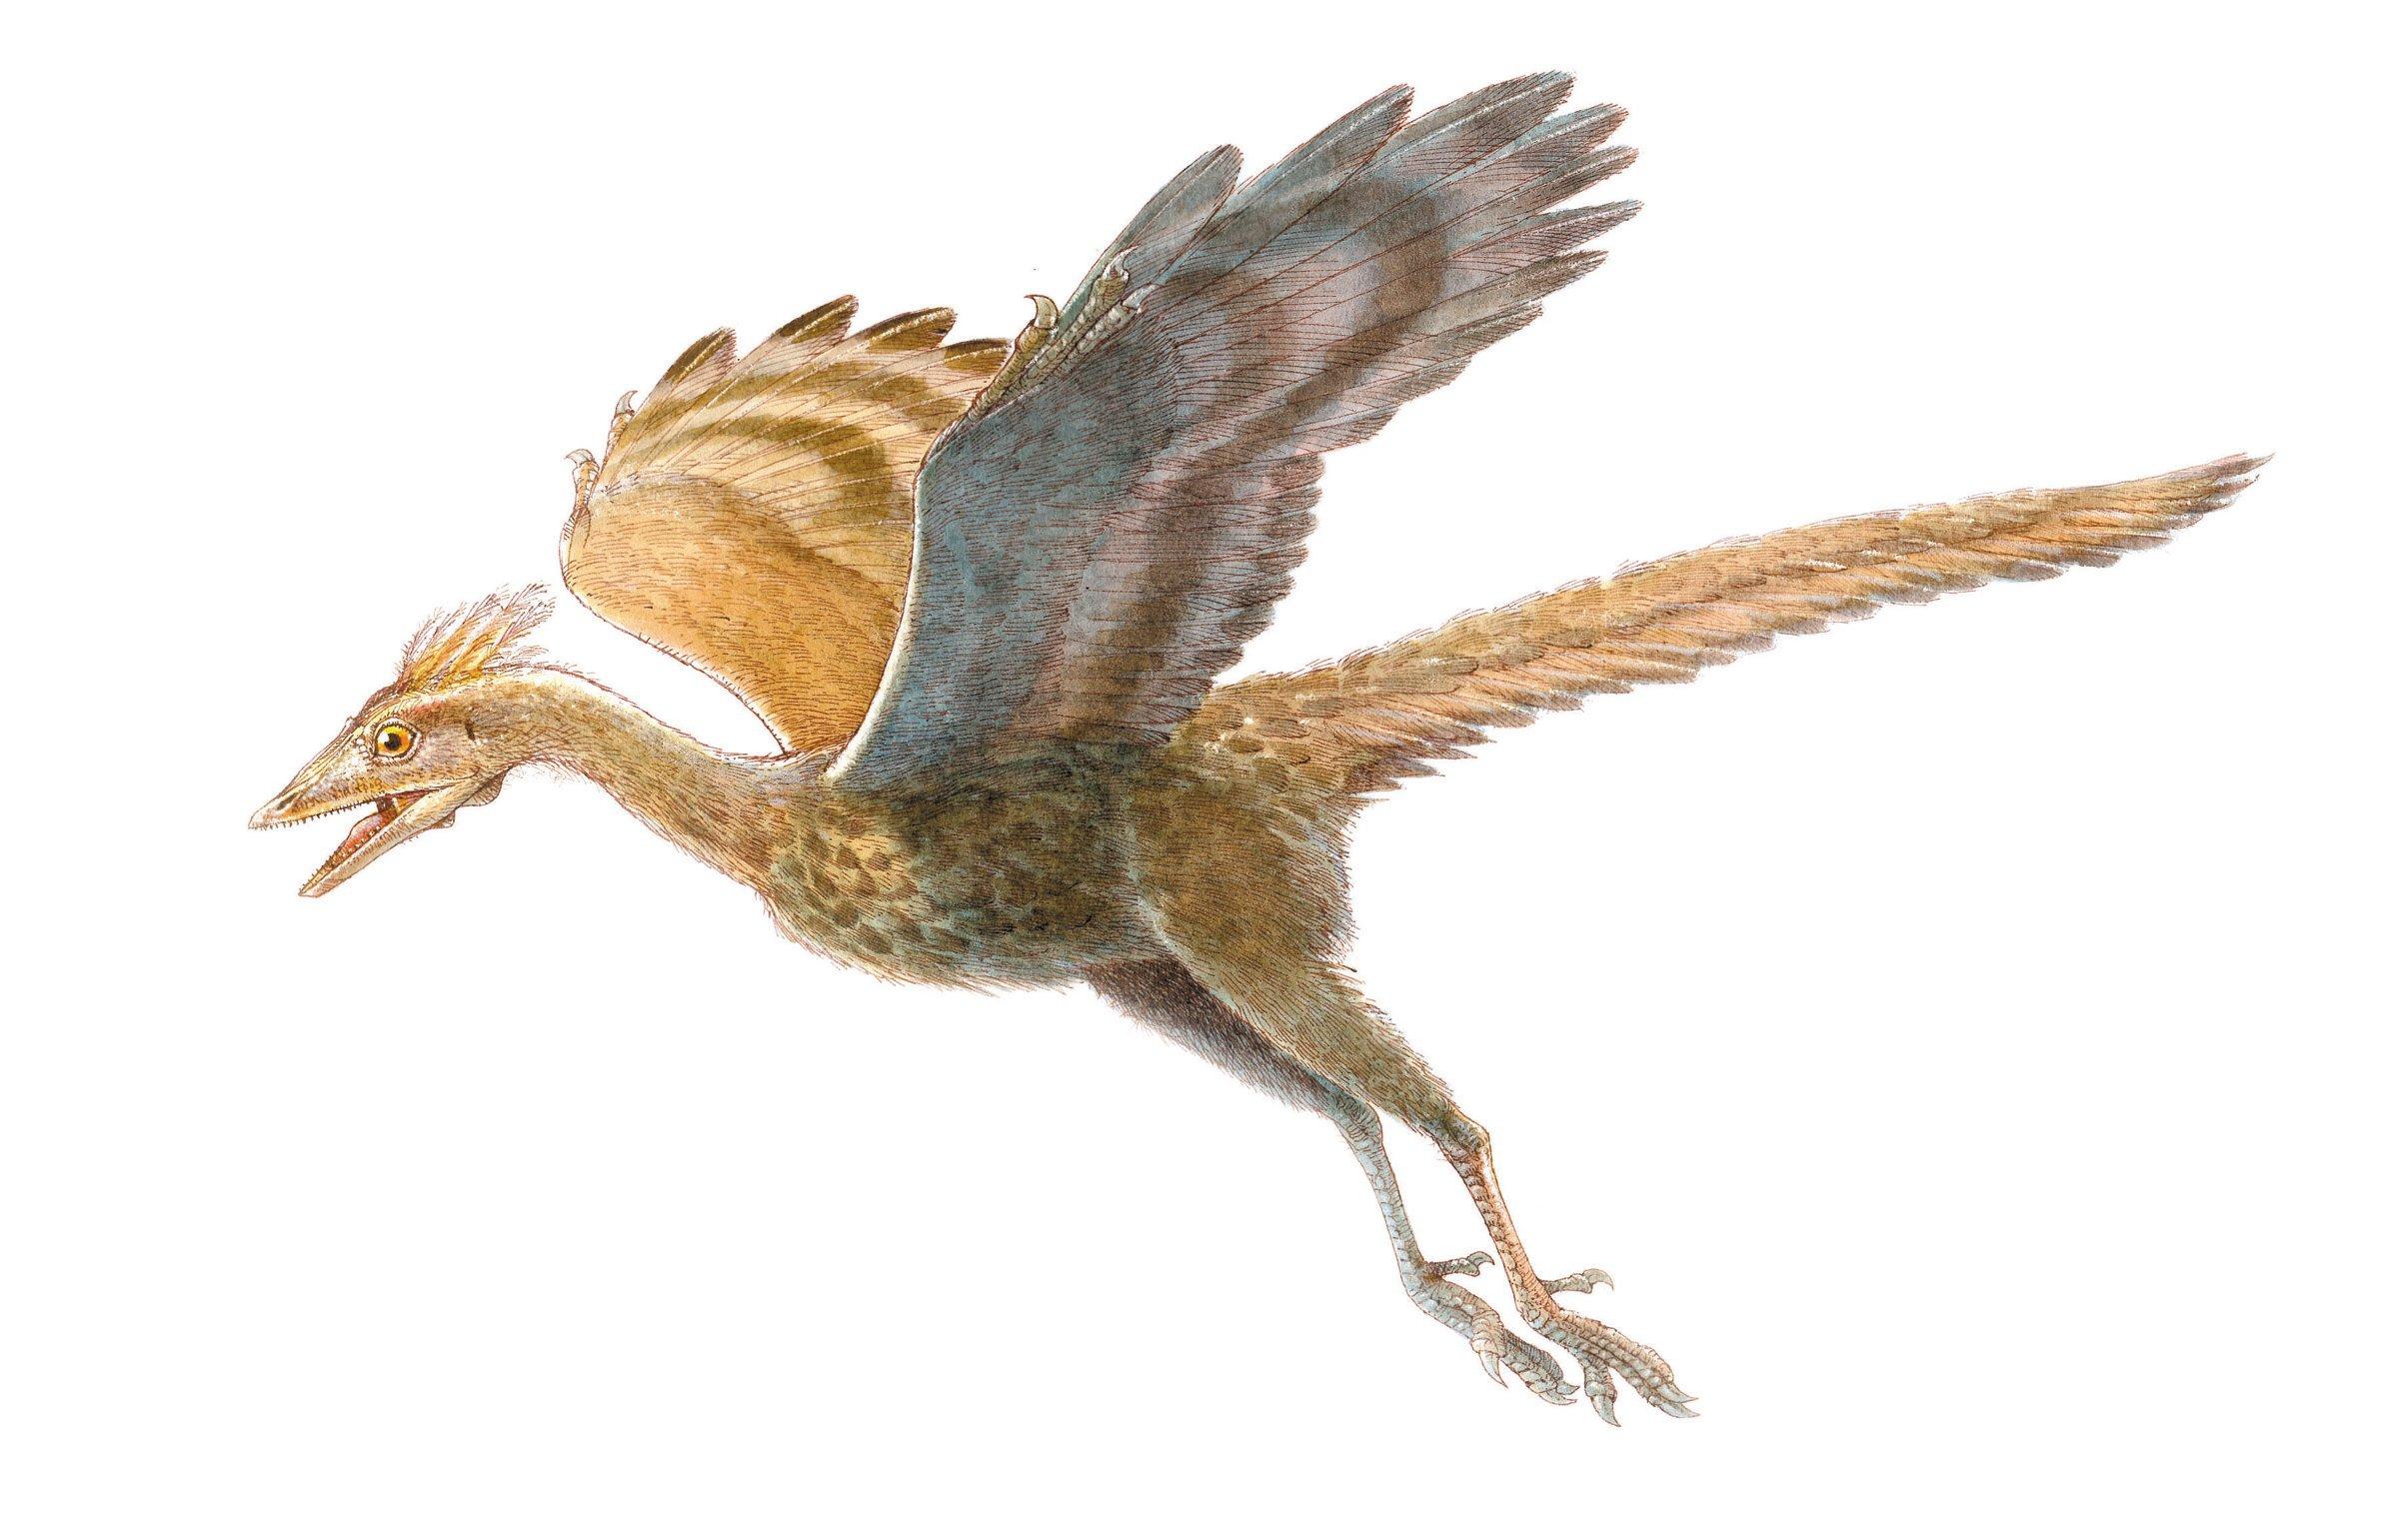 Archaeopteryx, Foto: lokissciphile.wordpress.com